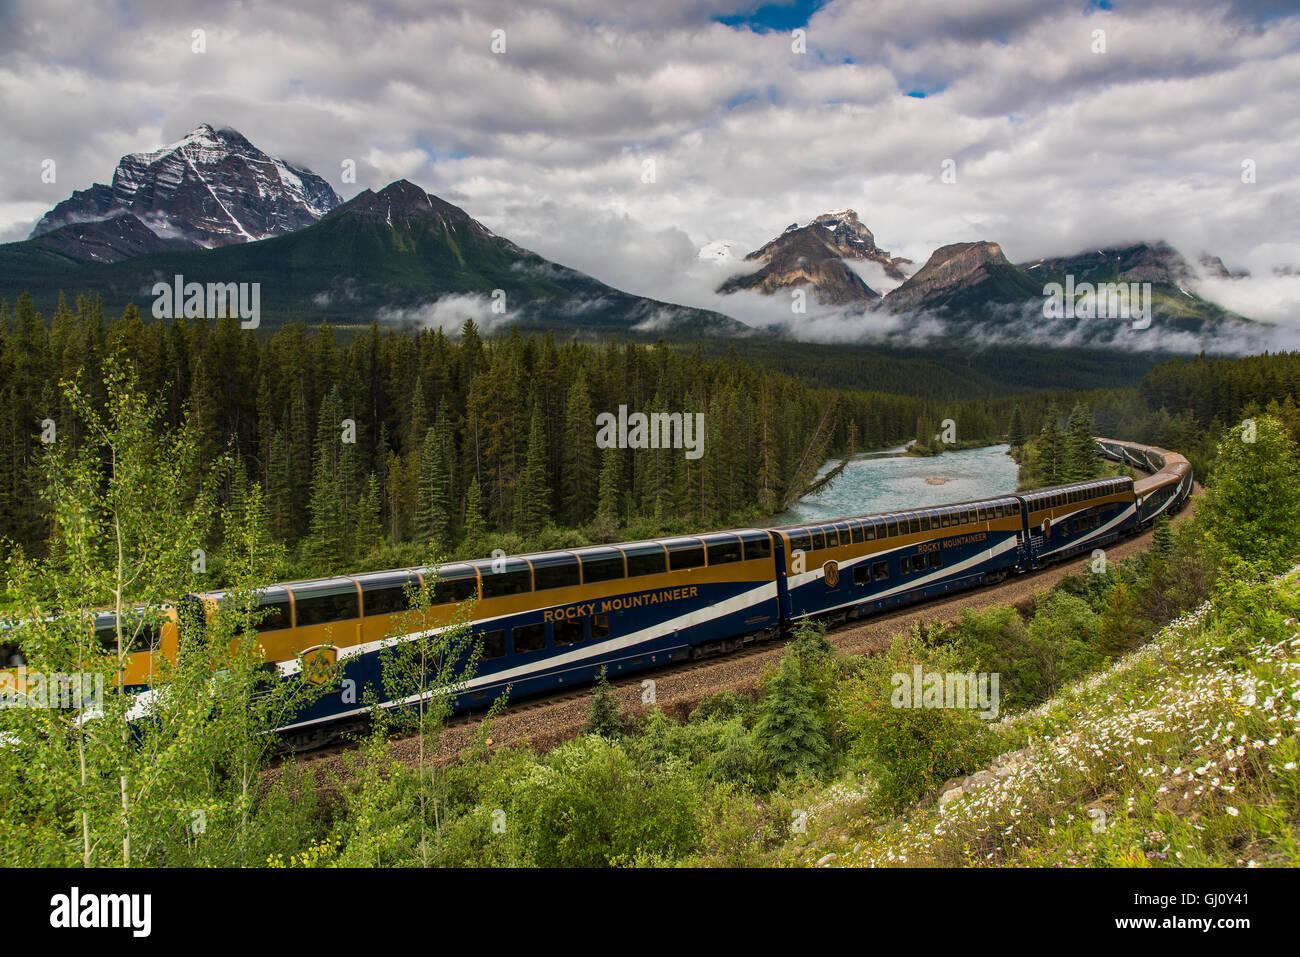 Rocky Mountaineer passenger train at Morant's Curve, Banff National Park, Alberta, Canada - Stock Image